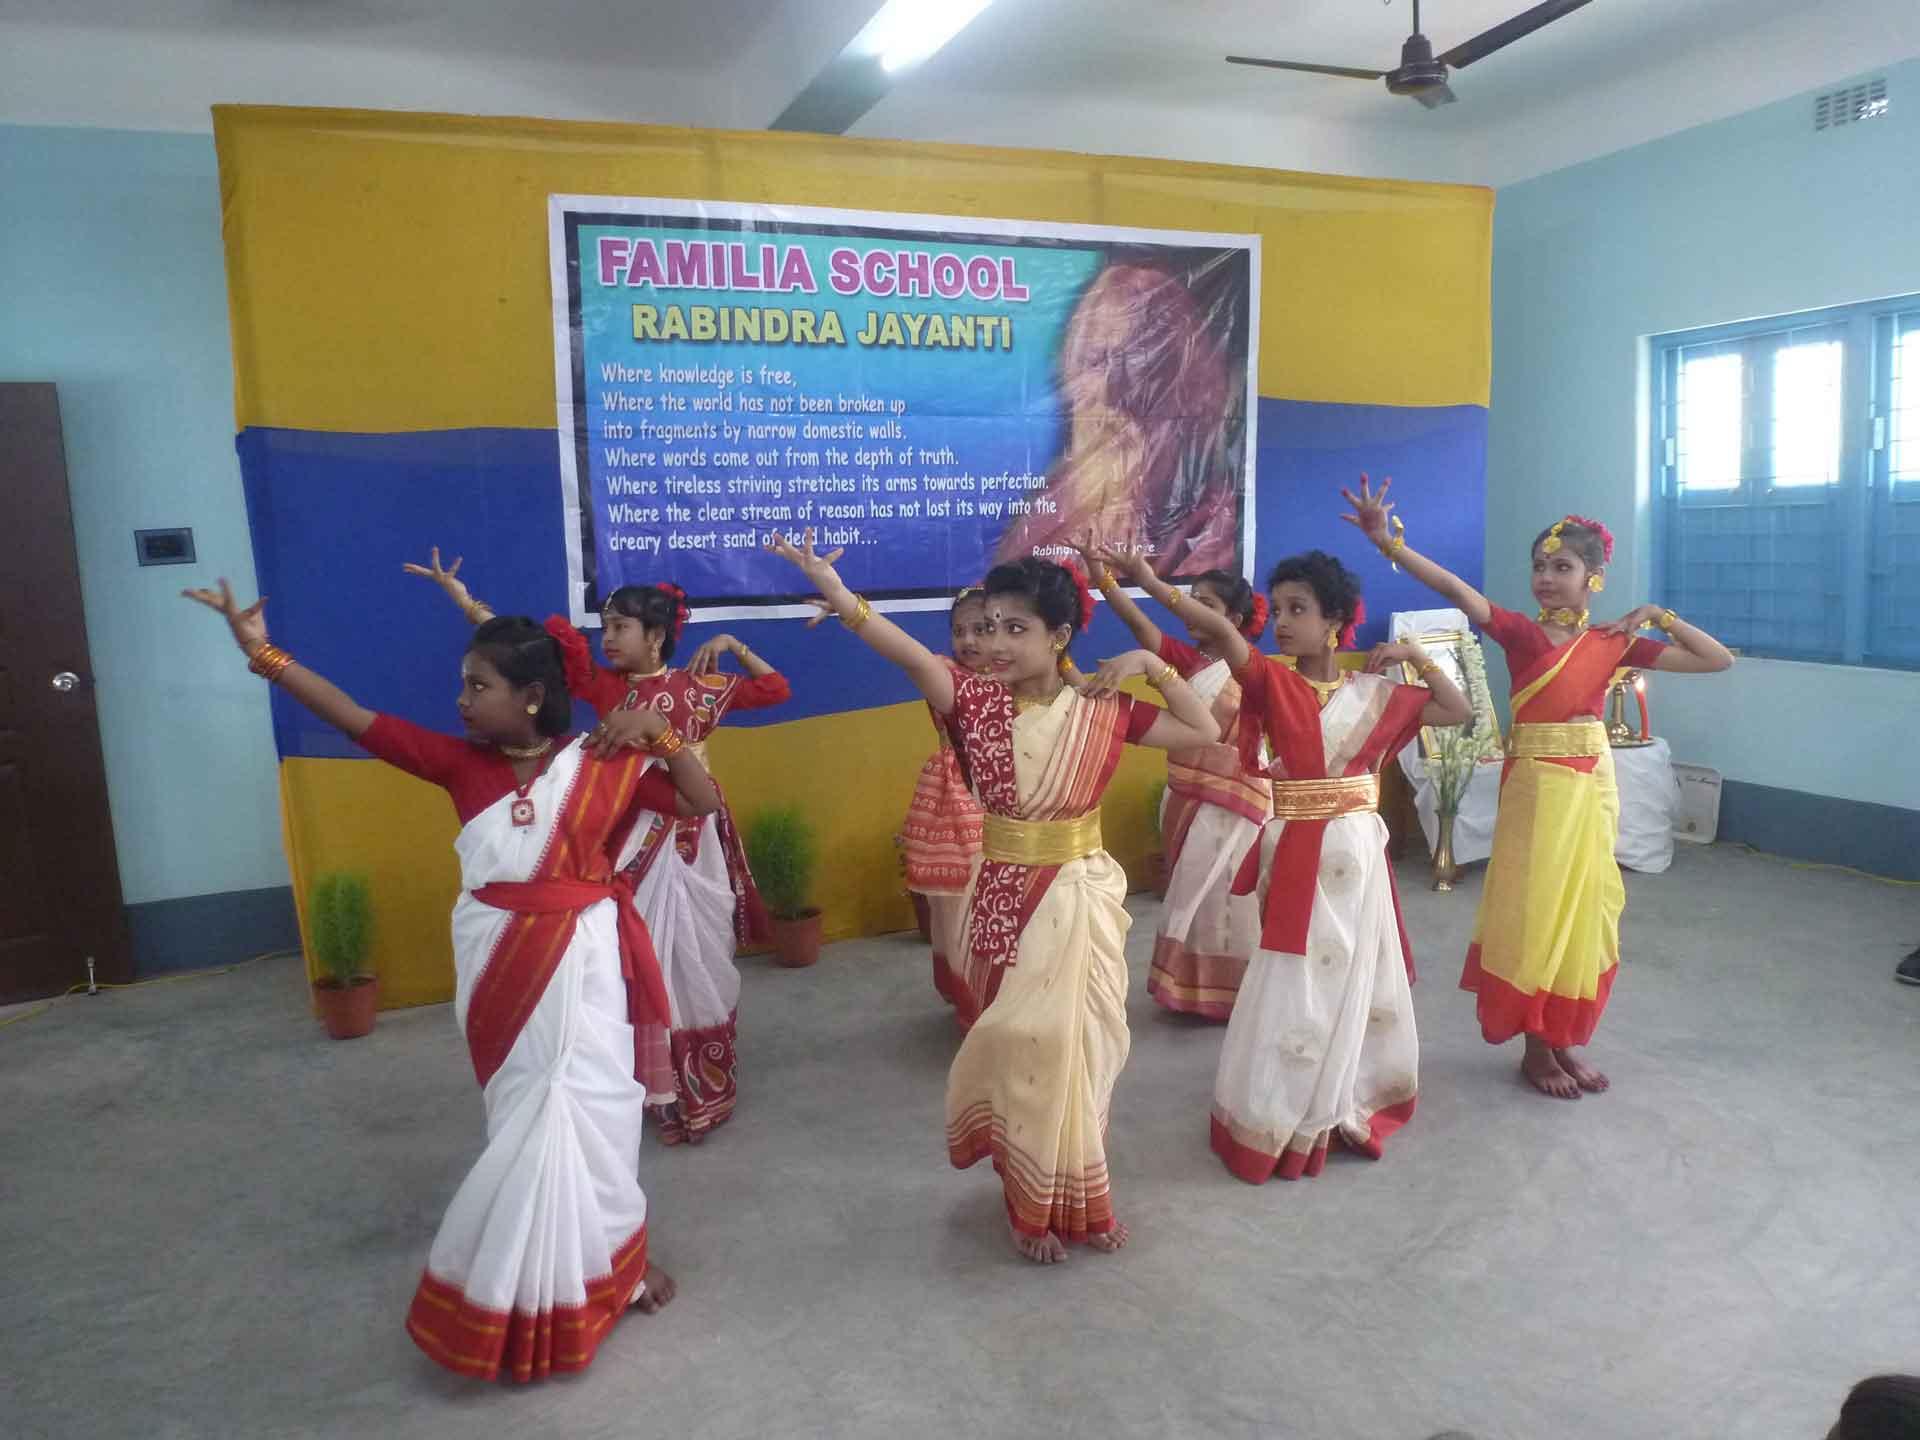 Rabindra Jayanti 19-20